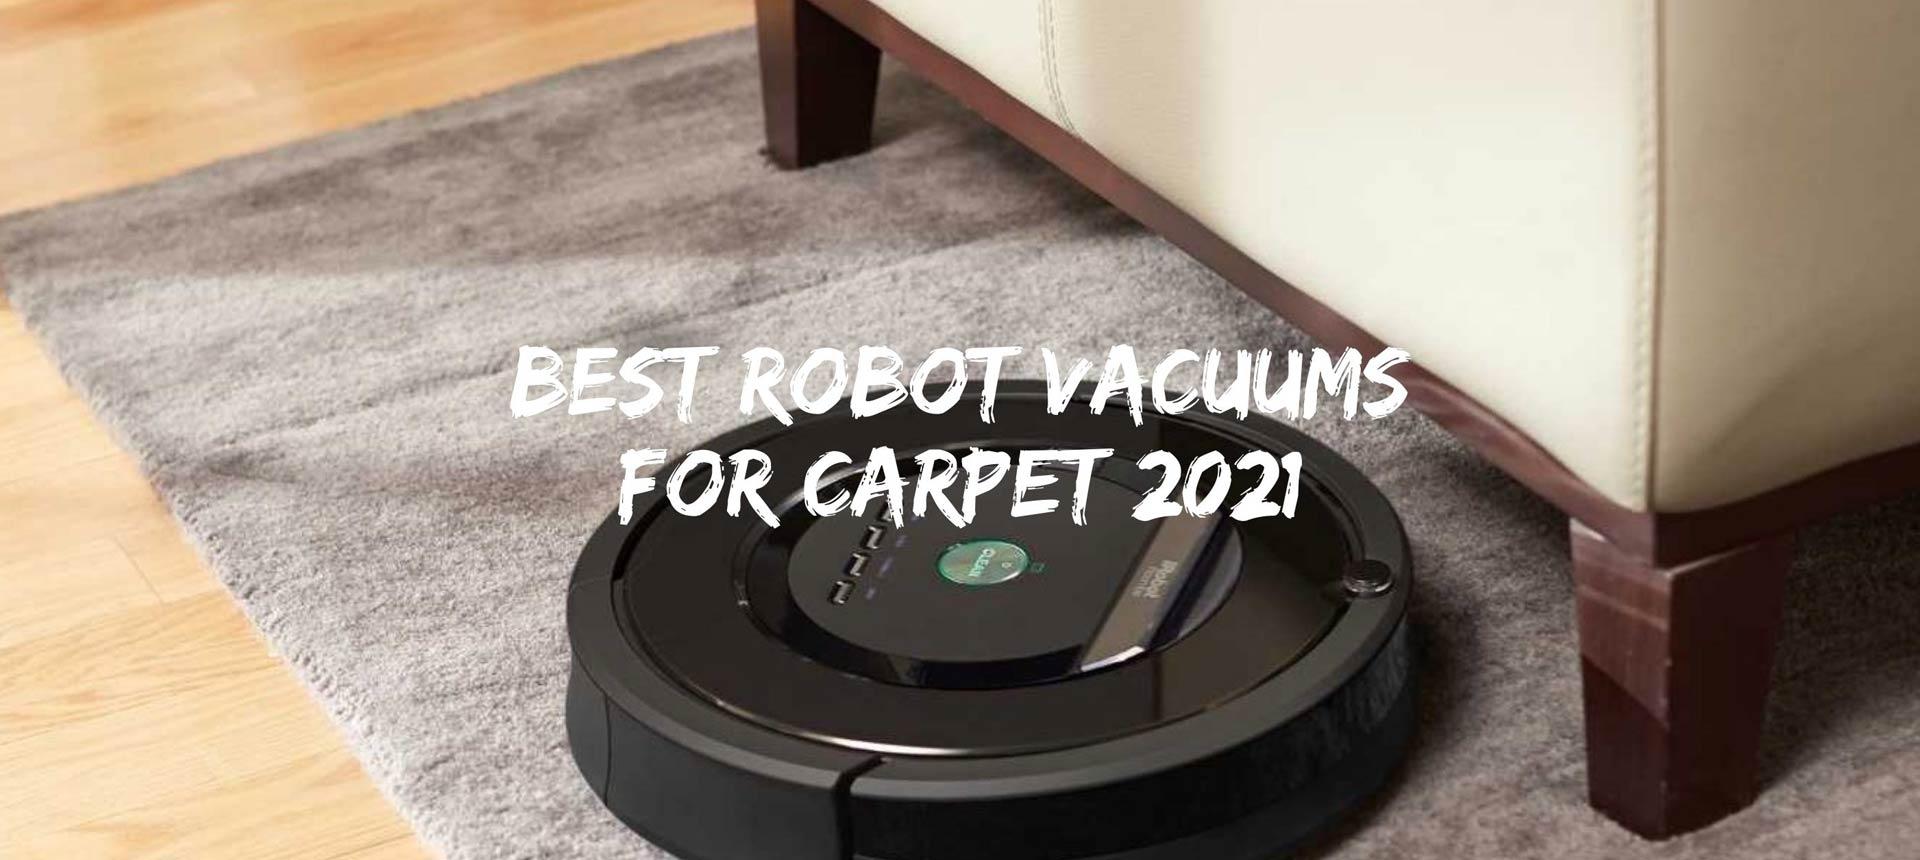 Best Robot Vacuums for Carpet 2021